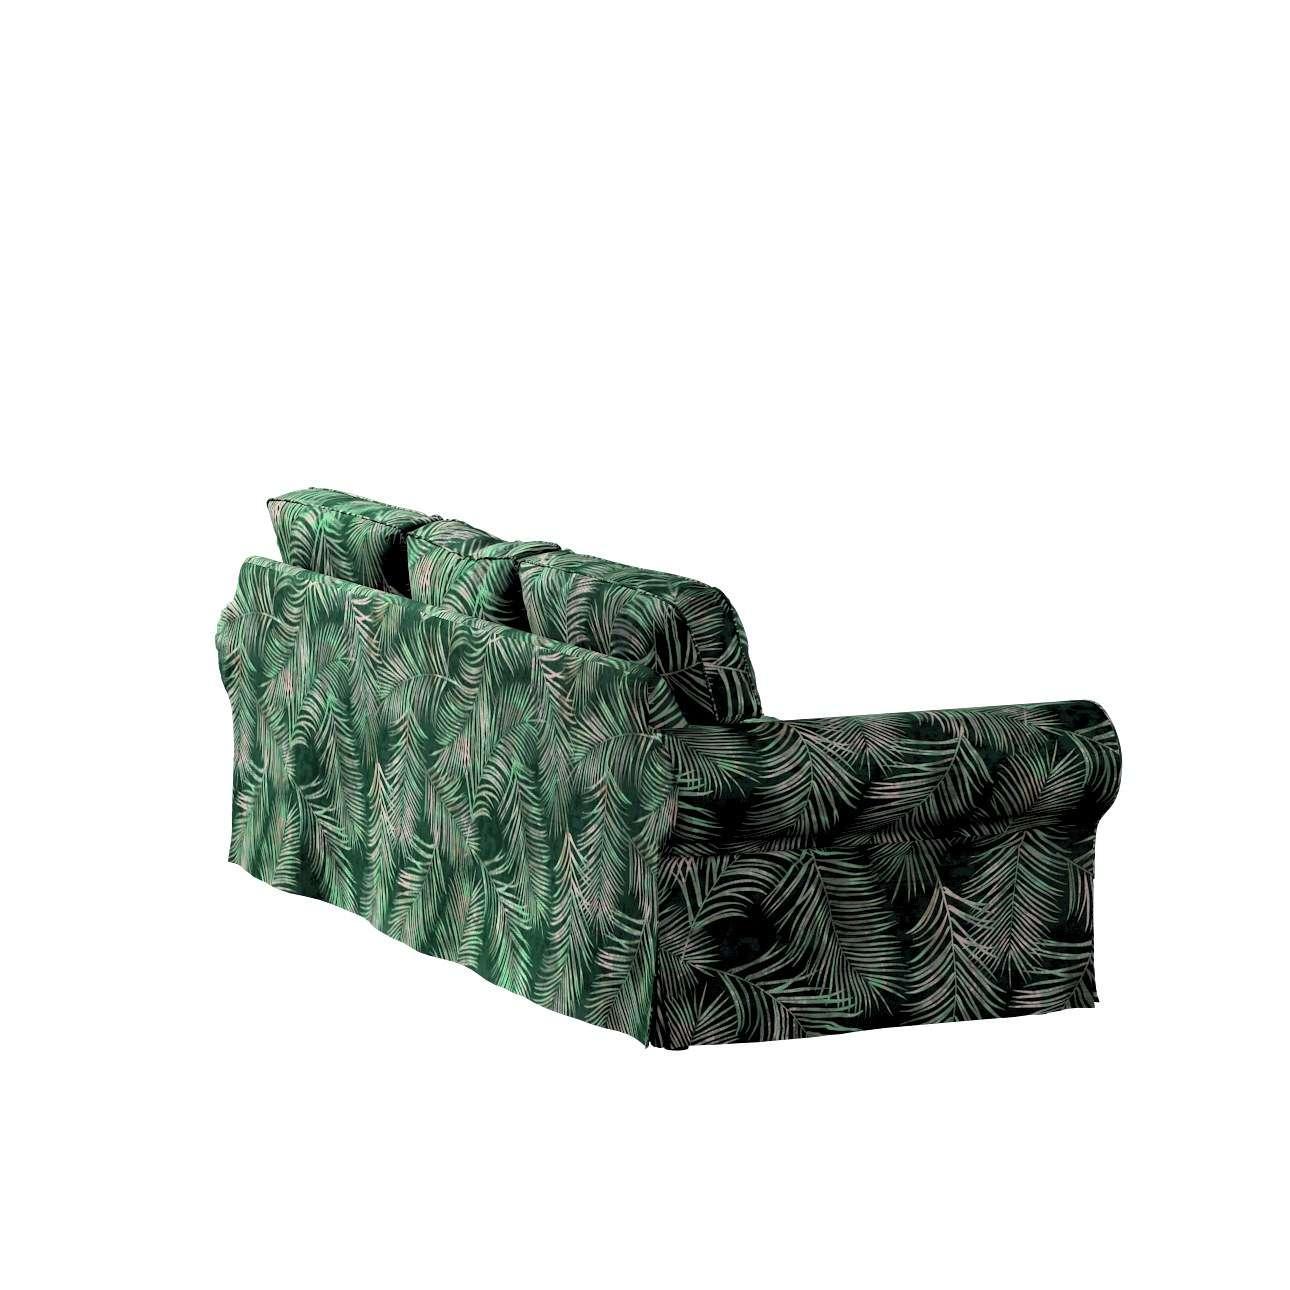 ektorp velvet gr n ektorp 3 sitzer sofabezug nicht ausklappbar. Black Bedroom Furniture Sets. Home Design Ideas